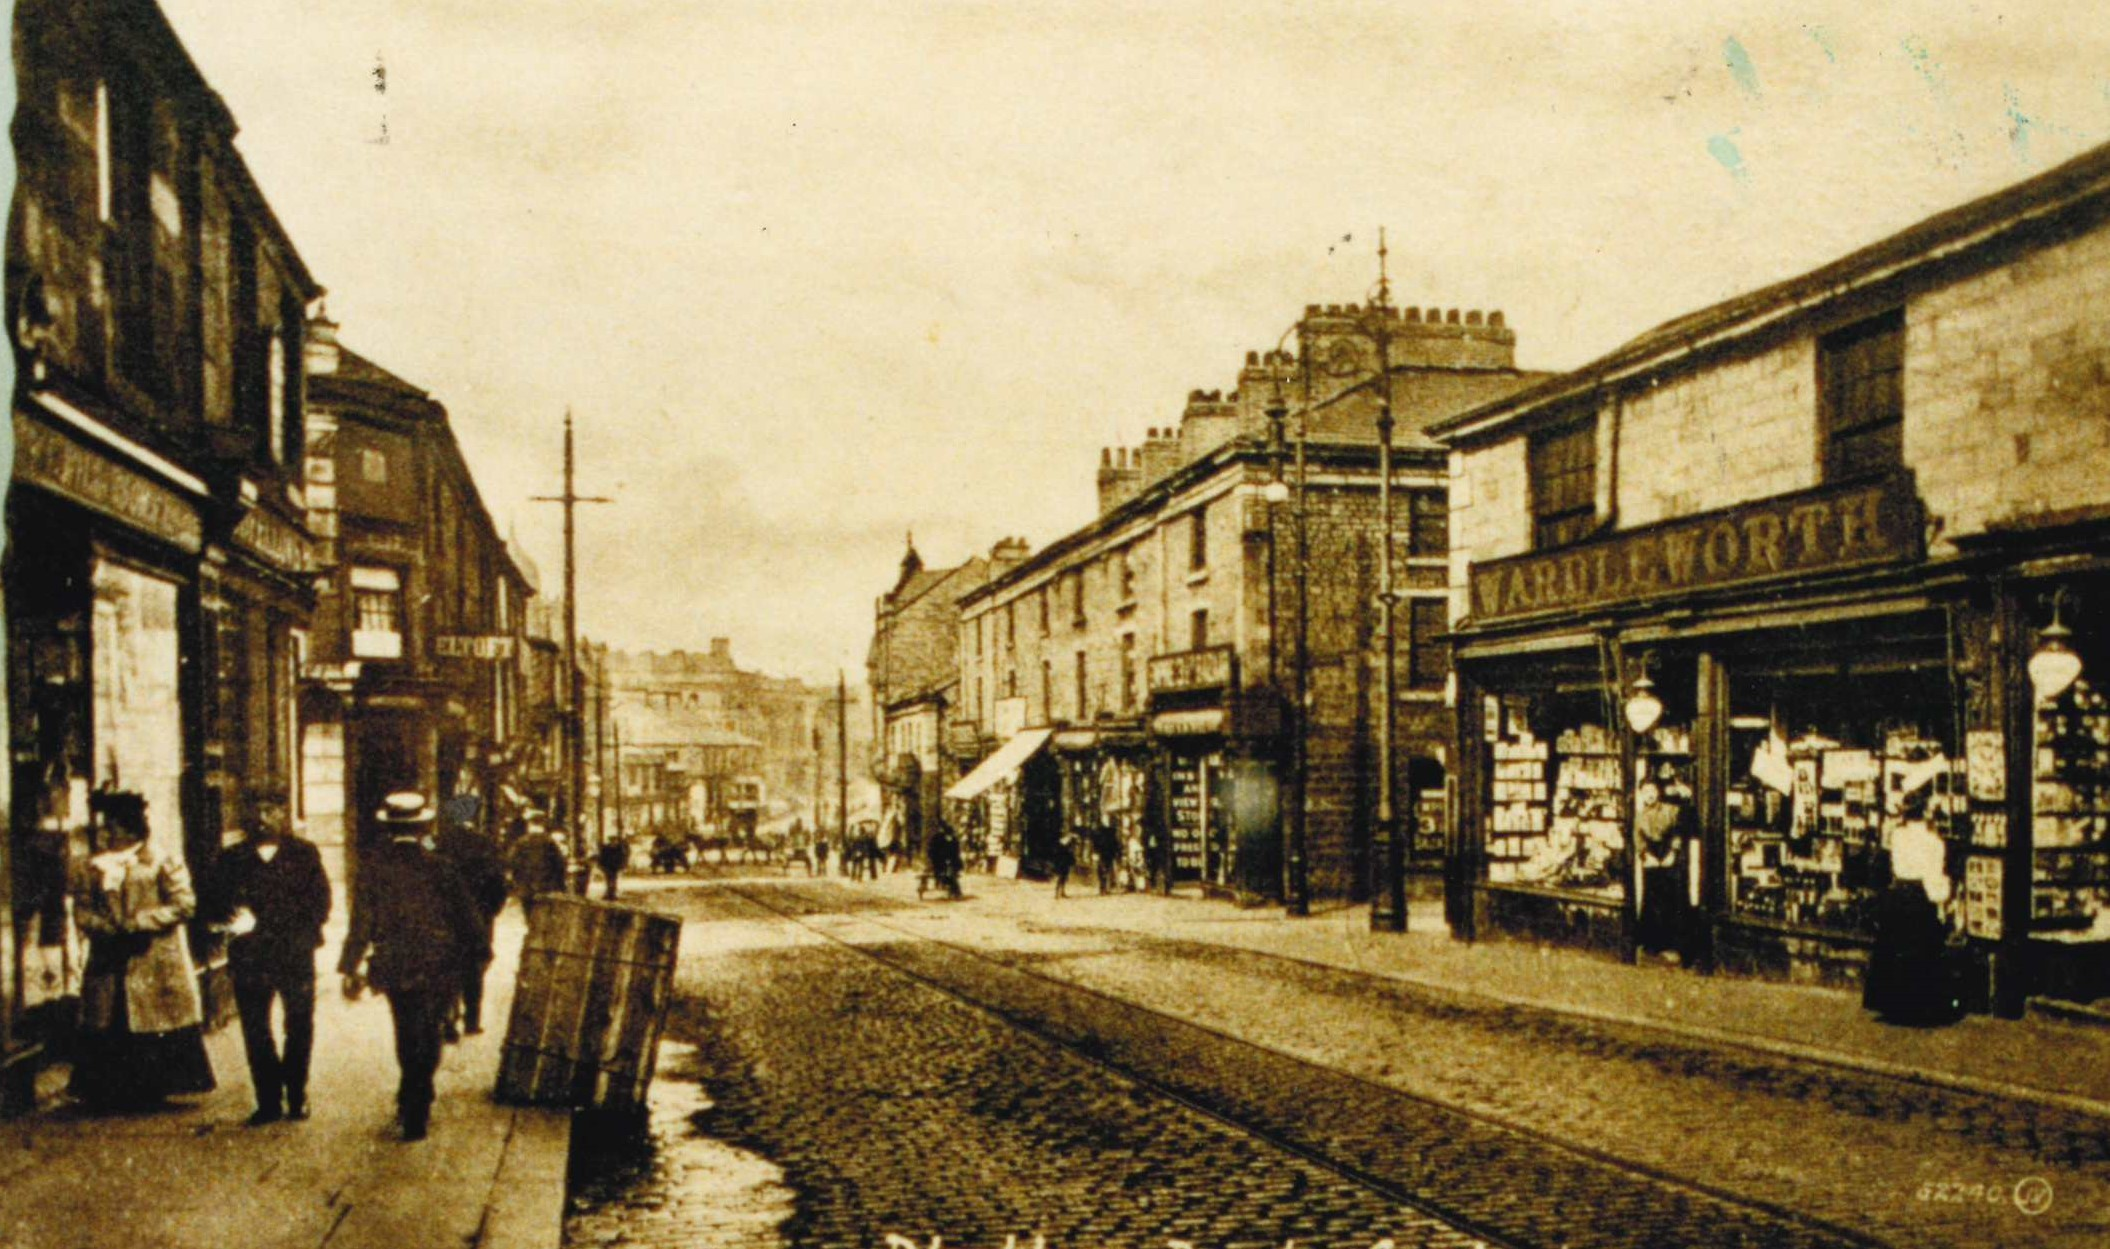 Bagian Wardleworth dari kehidupan Accrington sebelum Perang Dunia Pertama